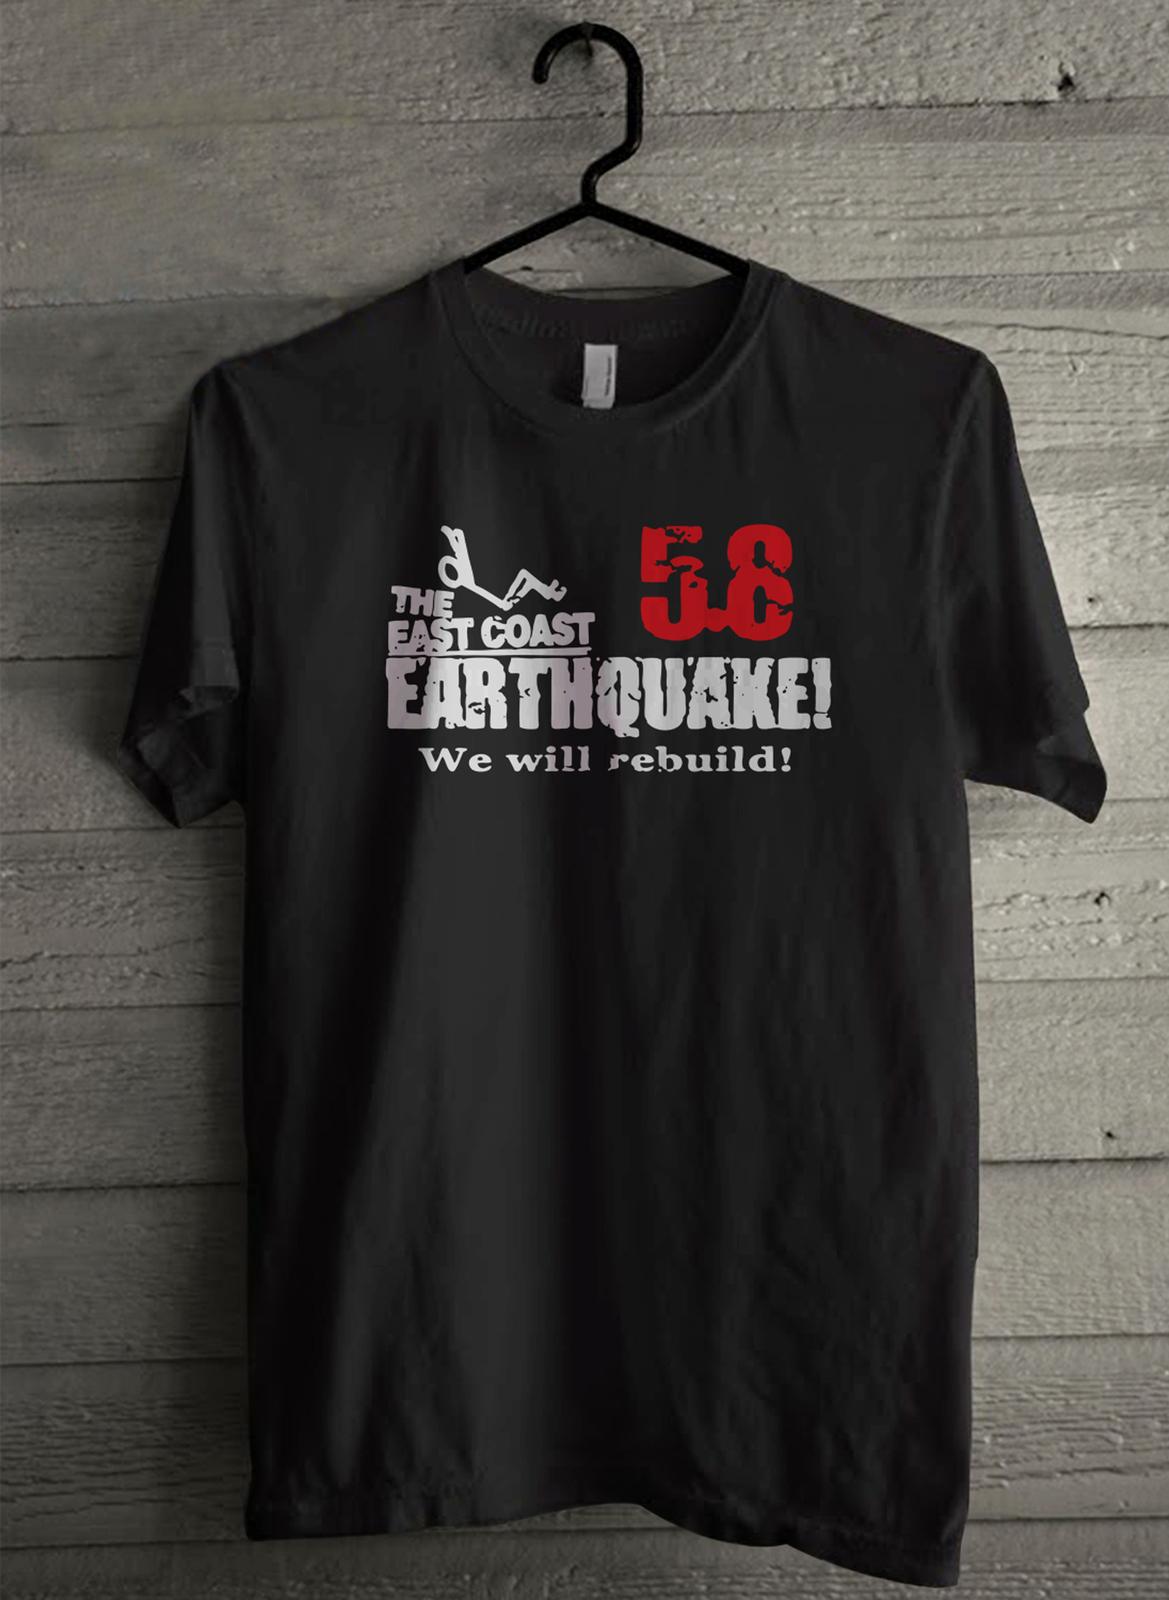 East coast earthquake 5